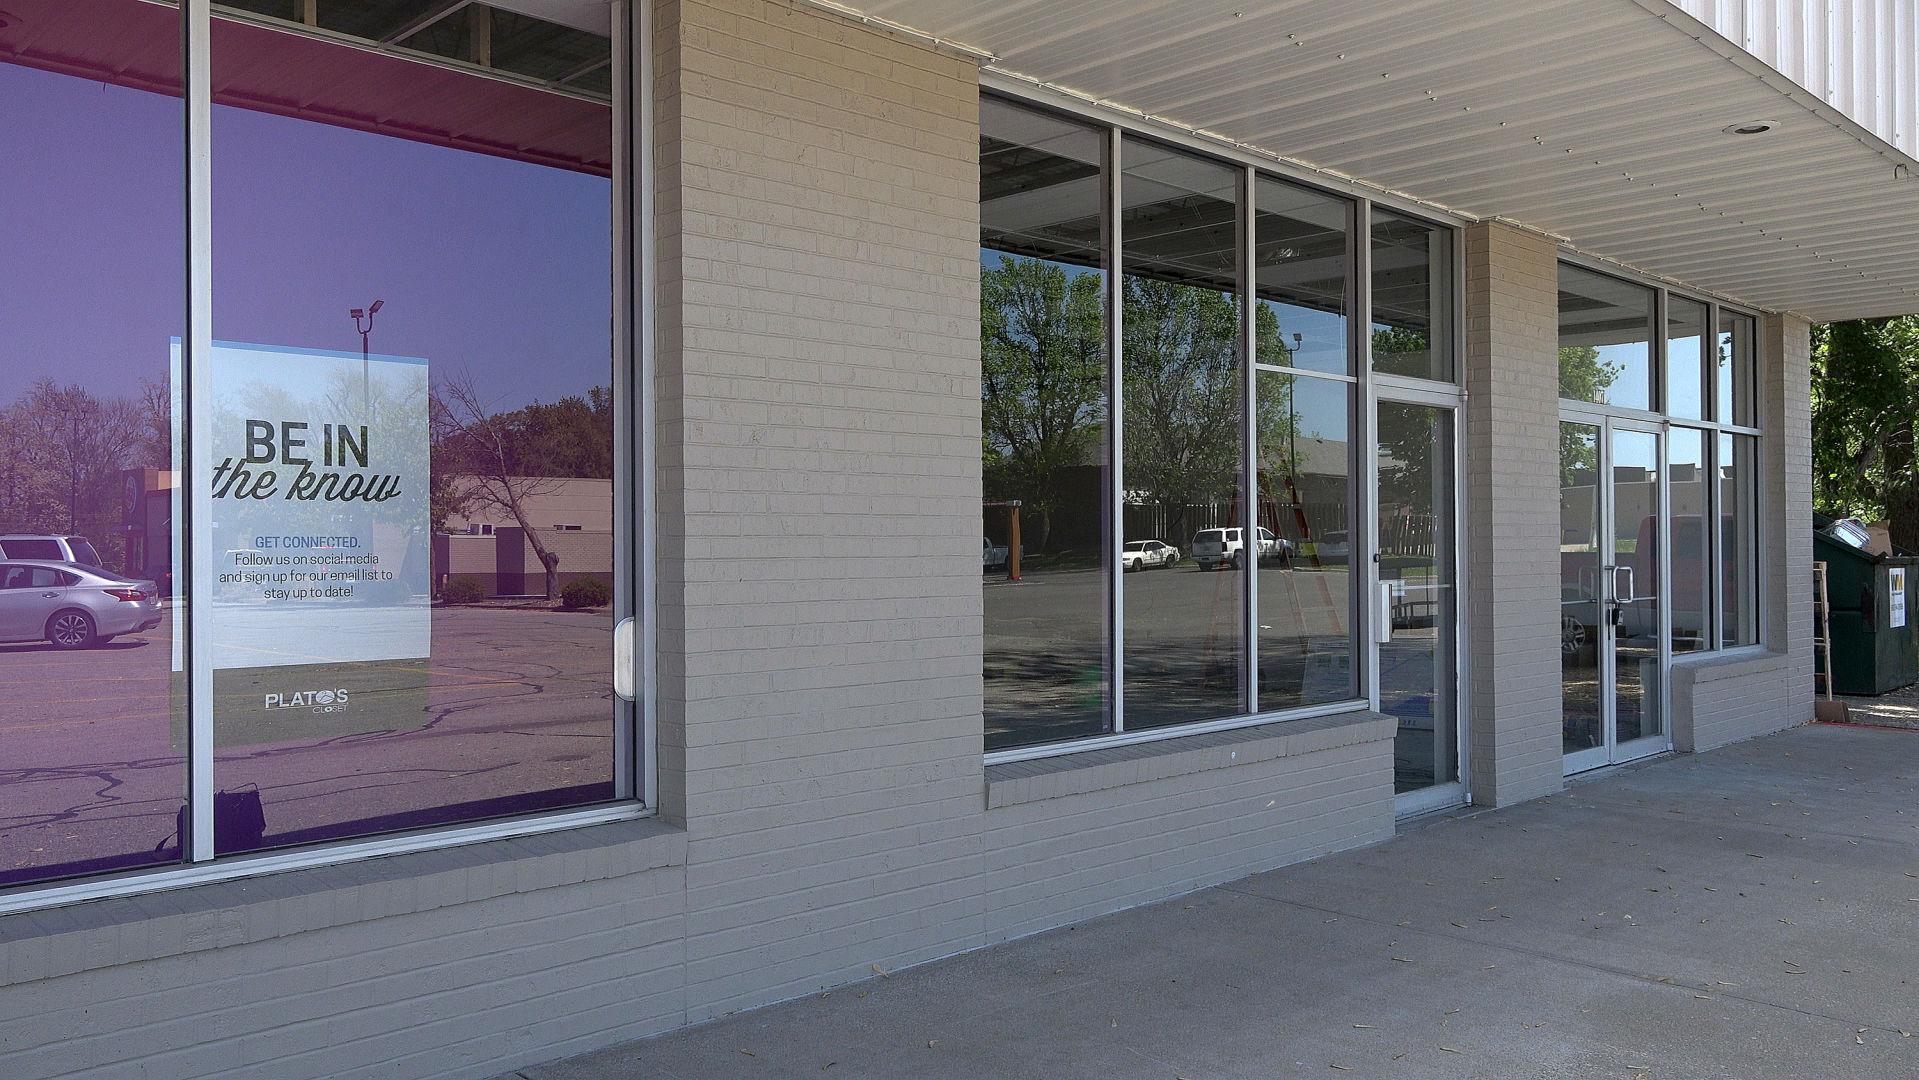 Plato S Closet Coming To St Joseph Local News